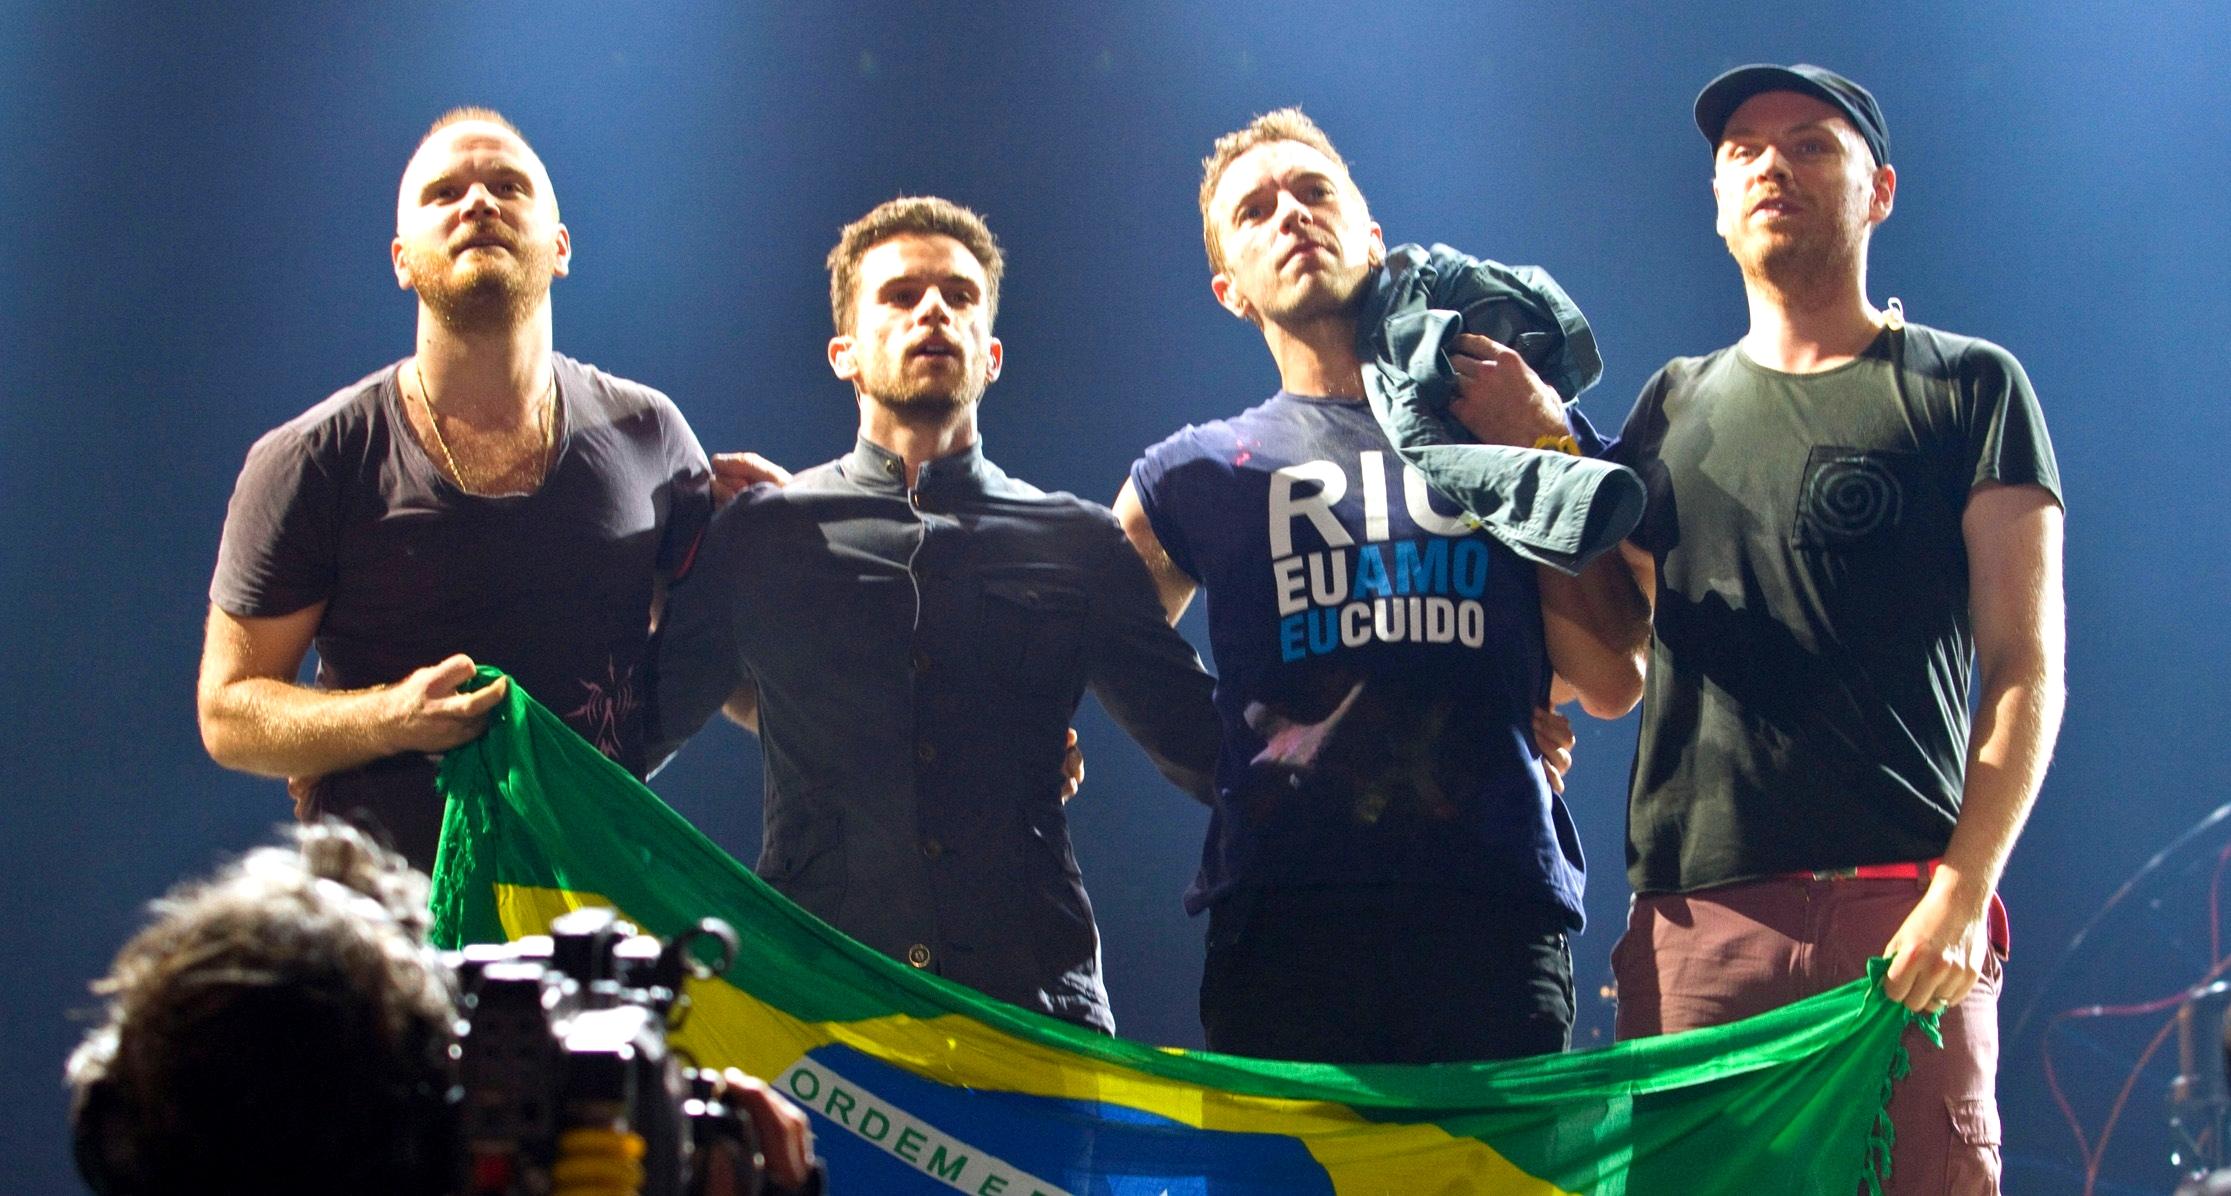 Coldplay Rock in Rio 2011 Marcos Hermes